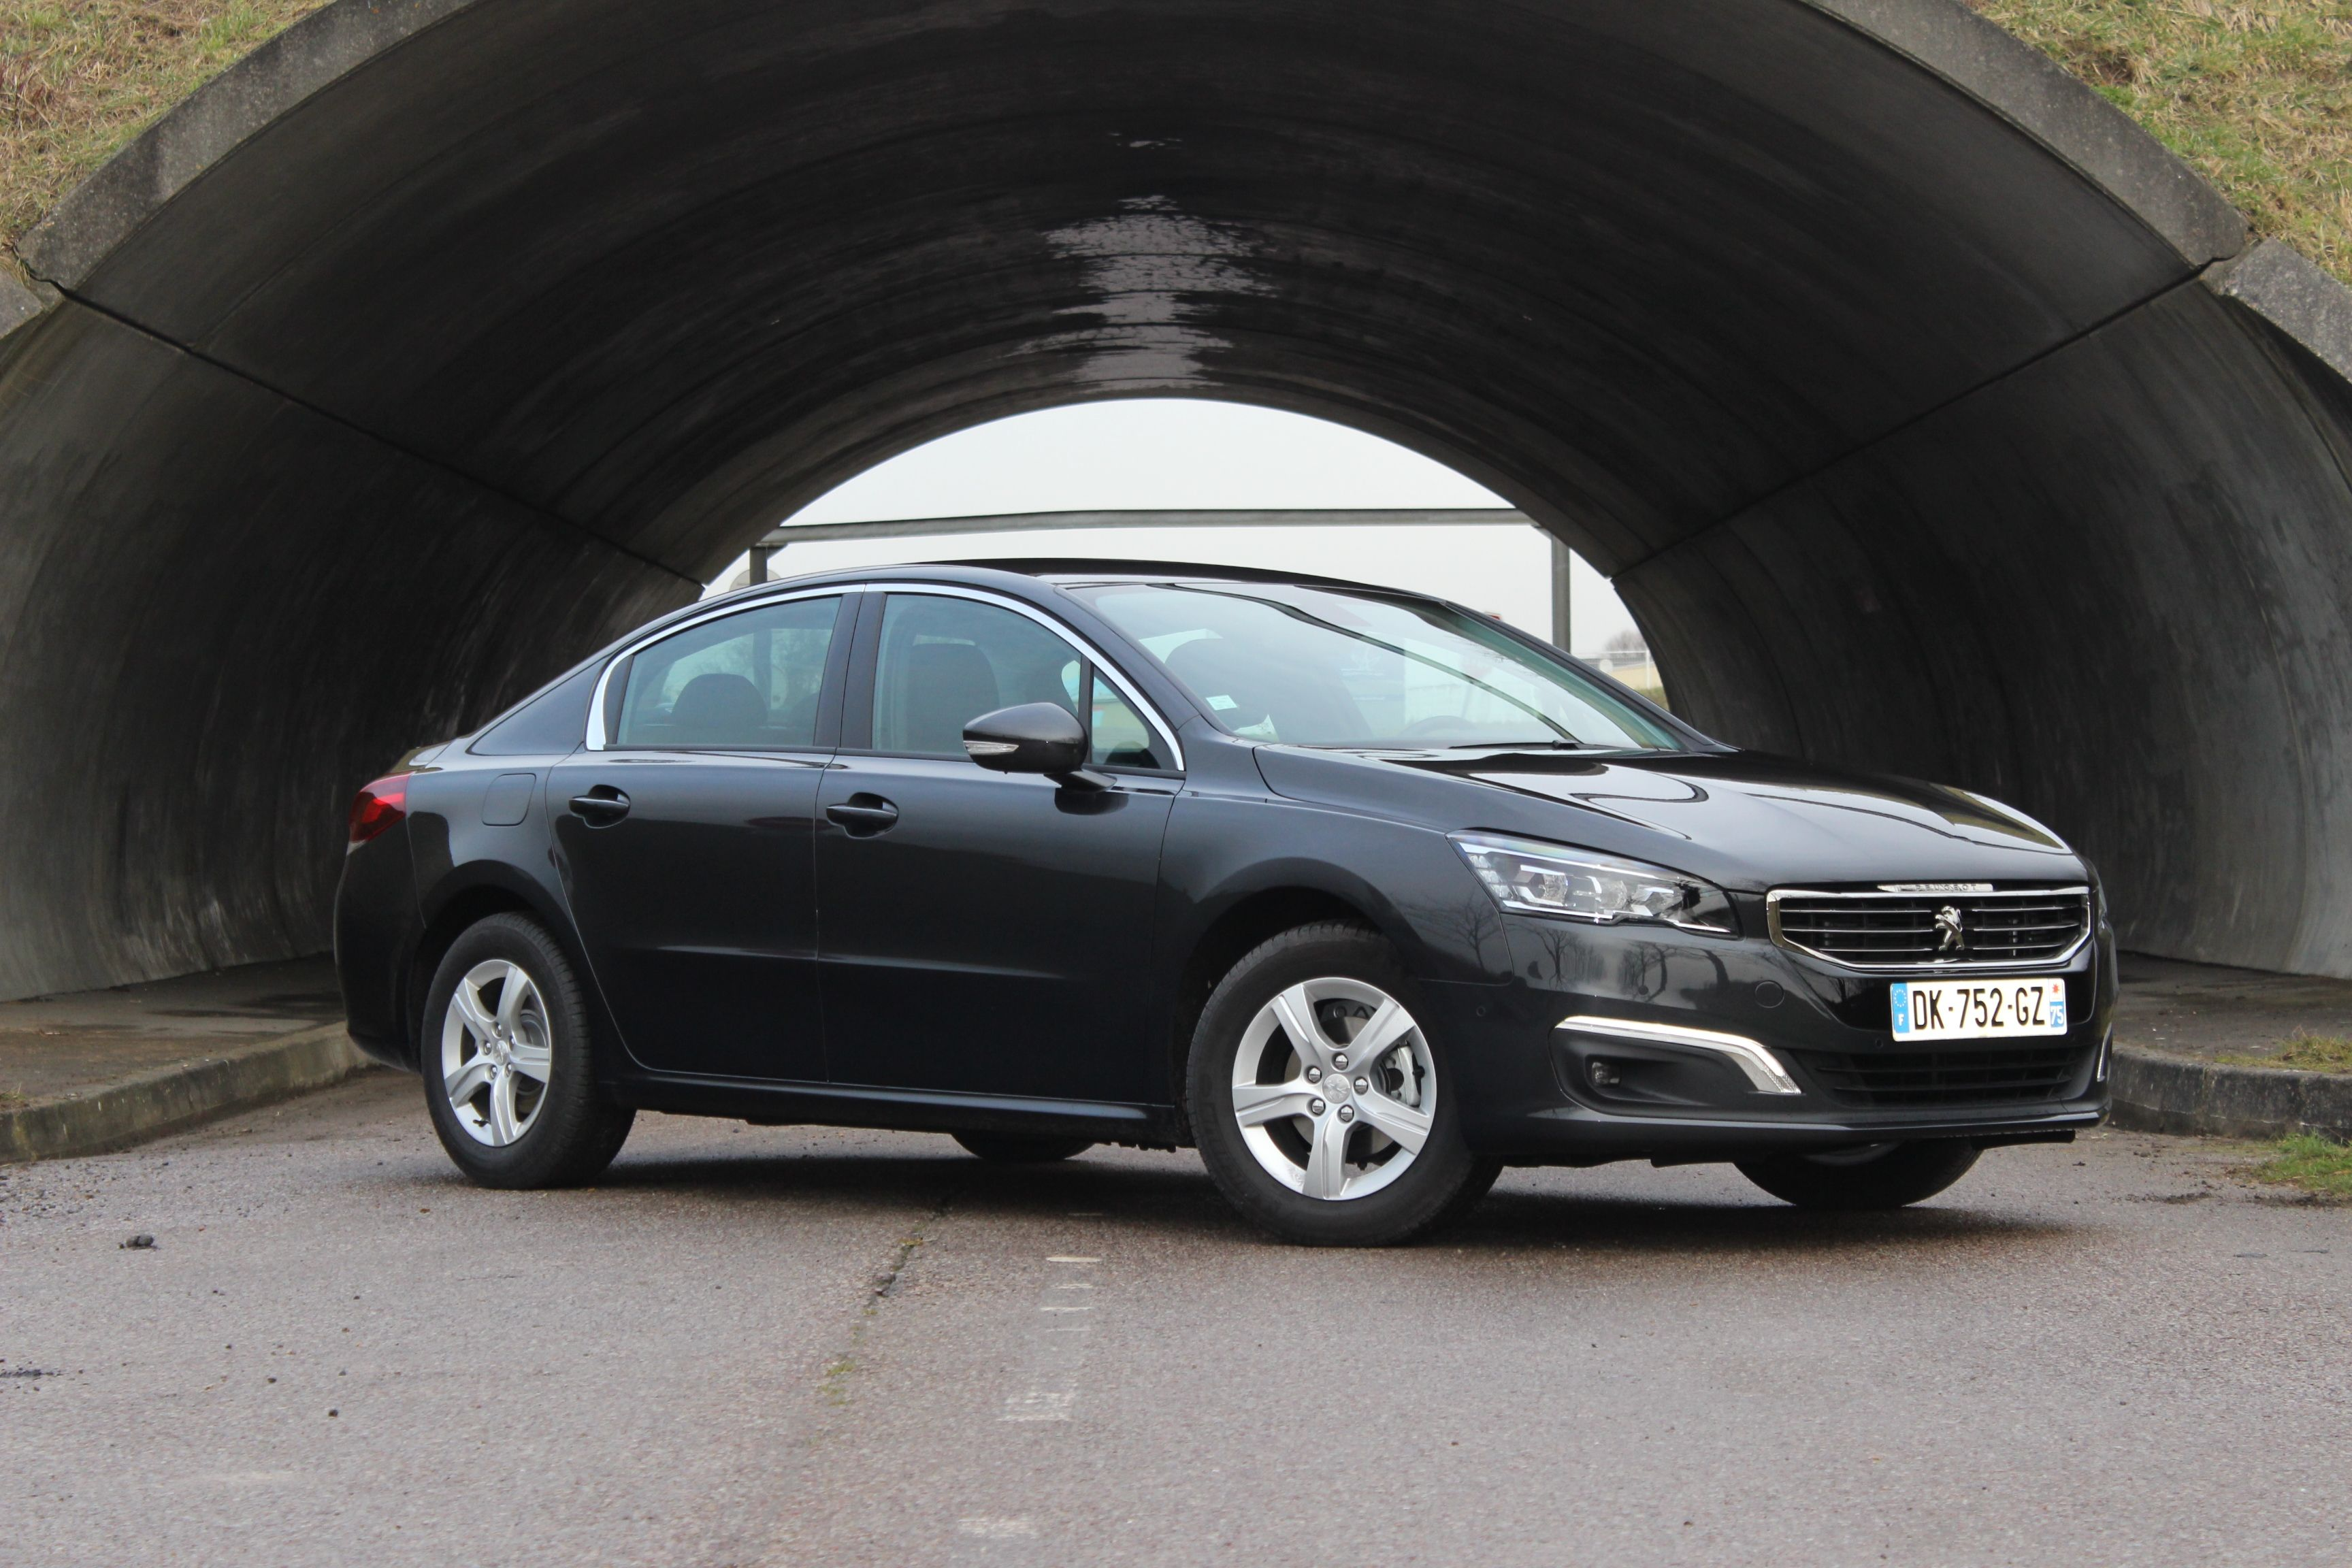 Peugeot-508-restylee-1-6-e-HDI-115-ETG6